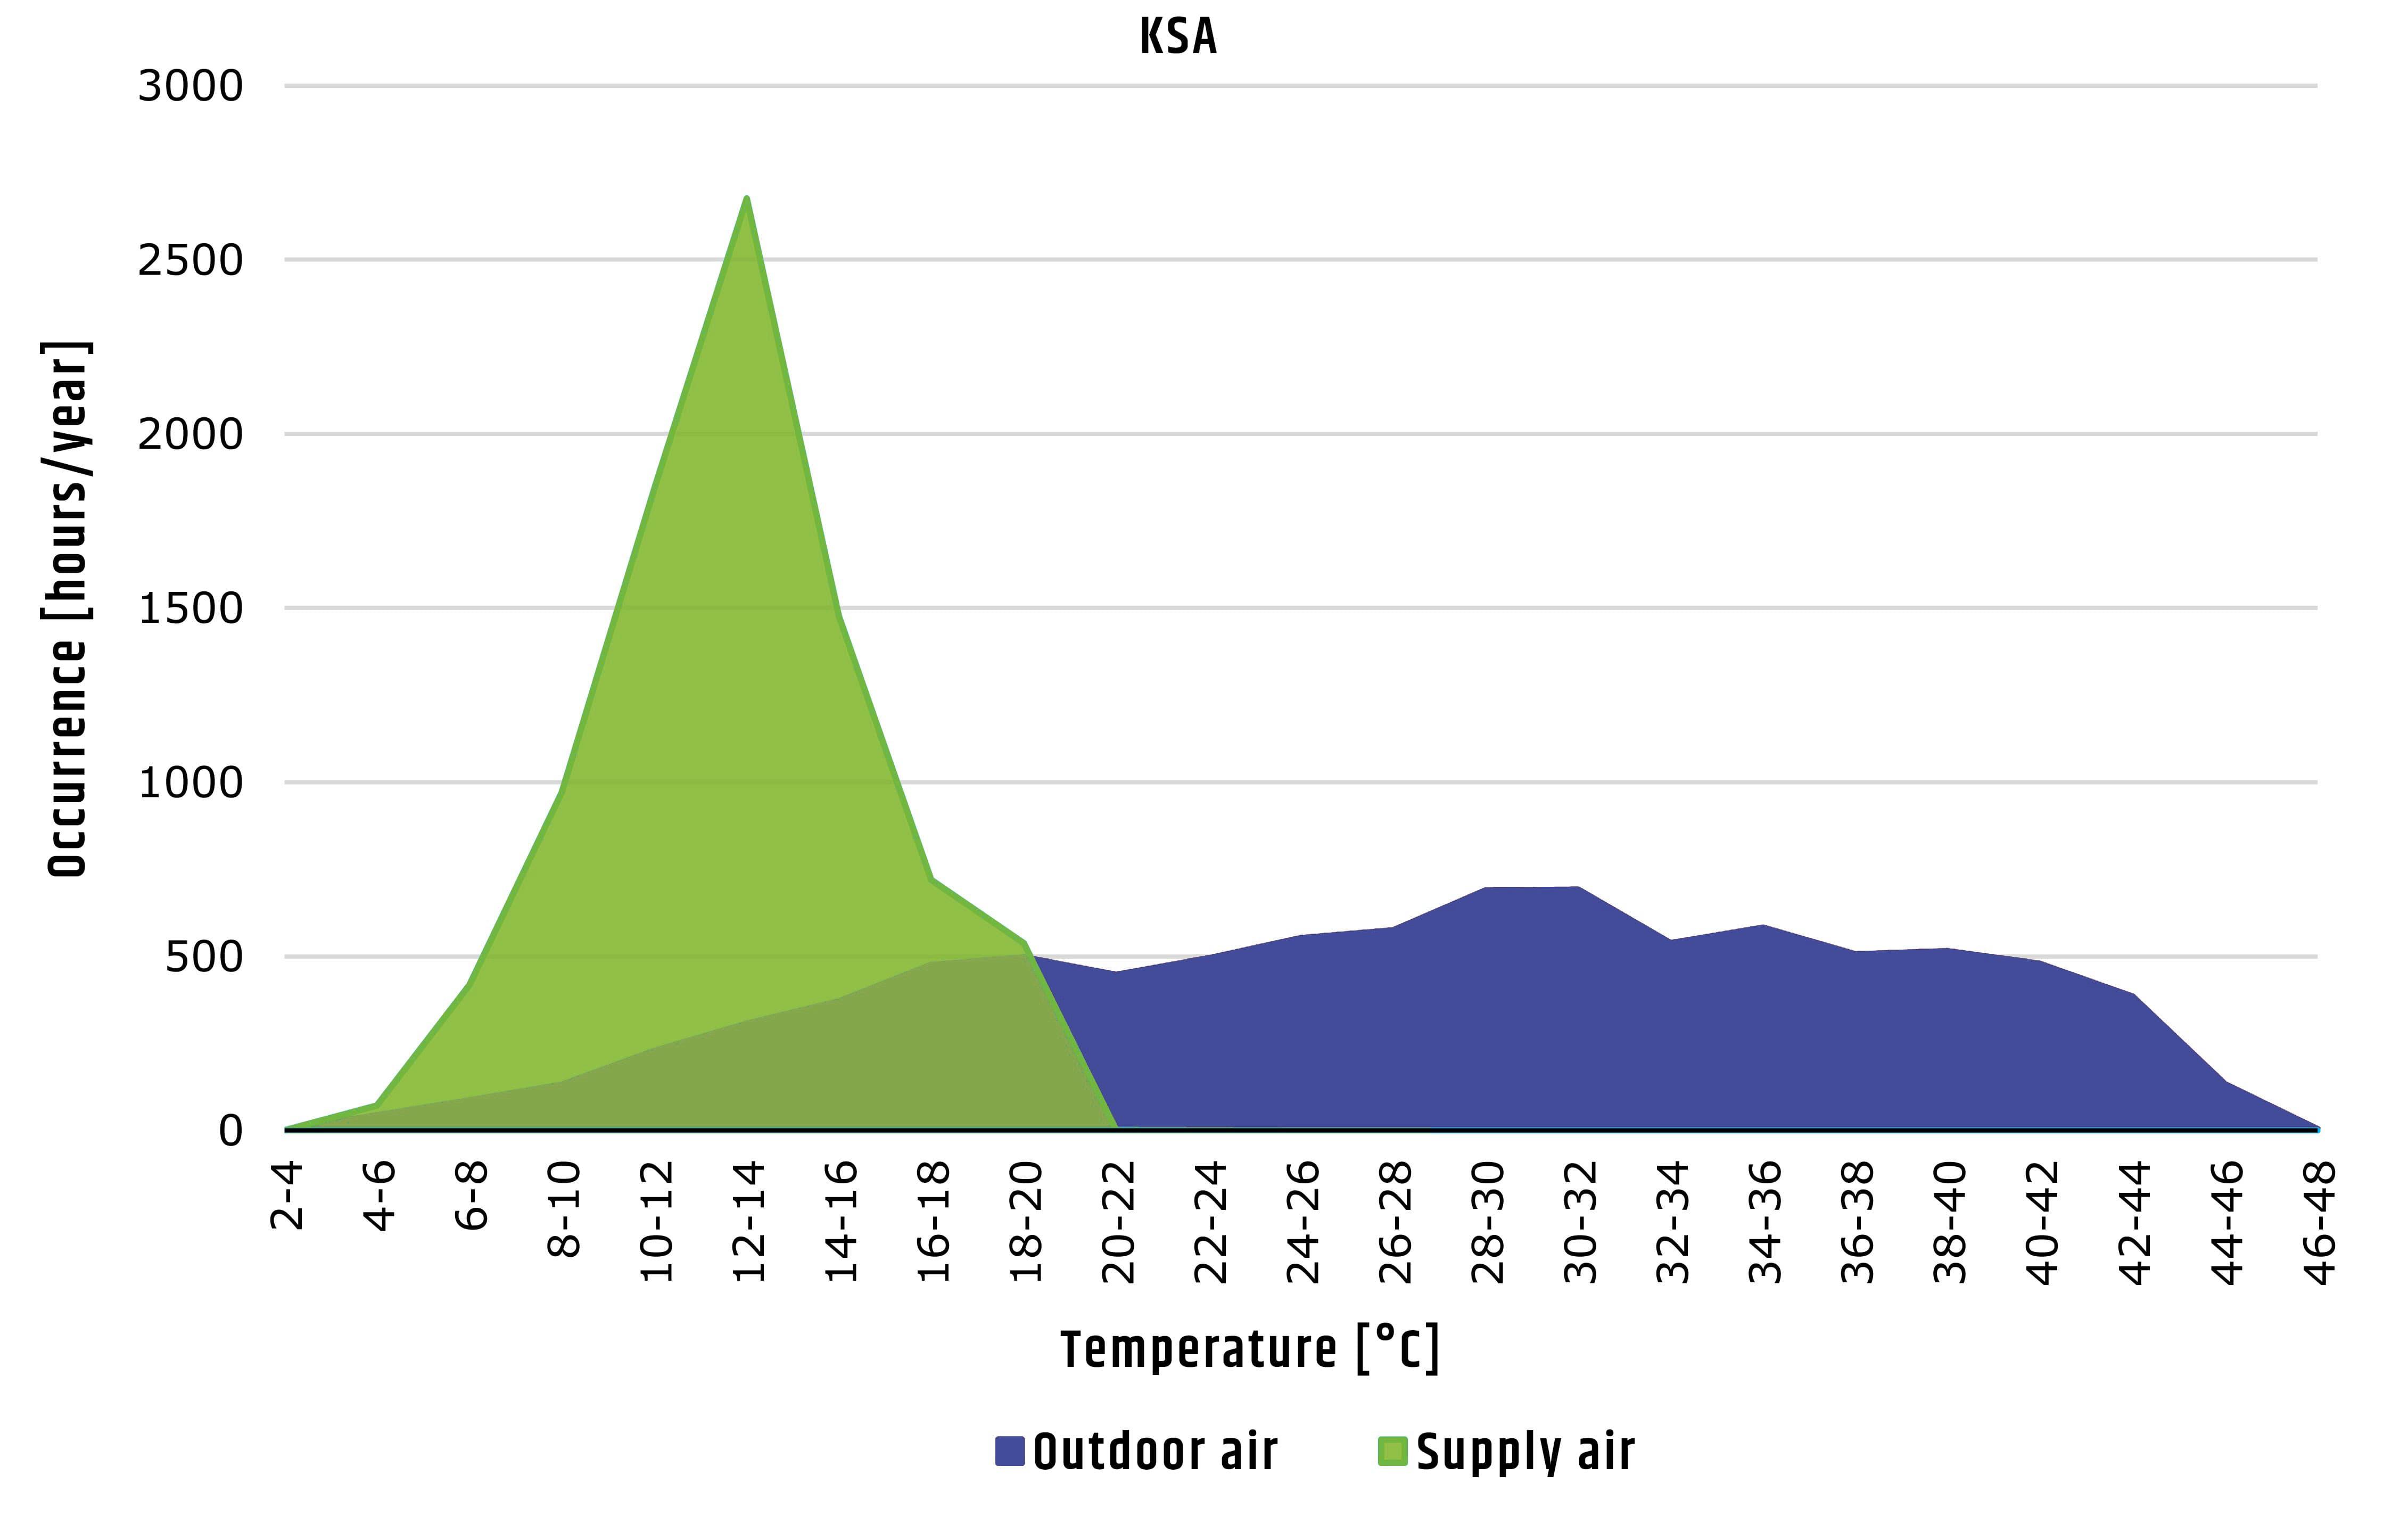 Performance evaporative cooling KSA